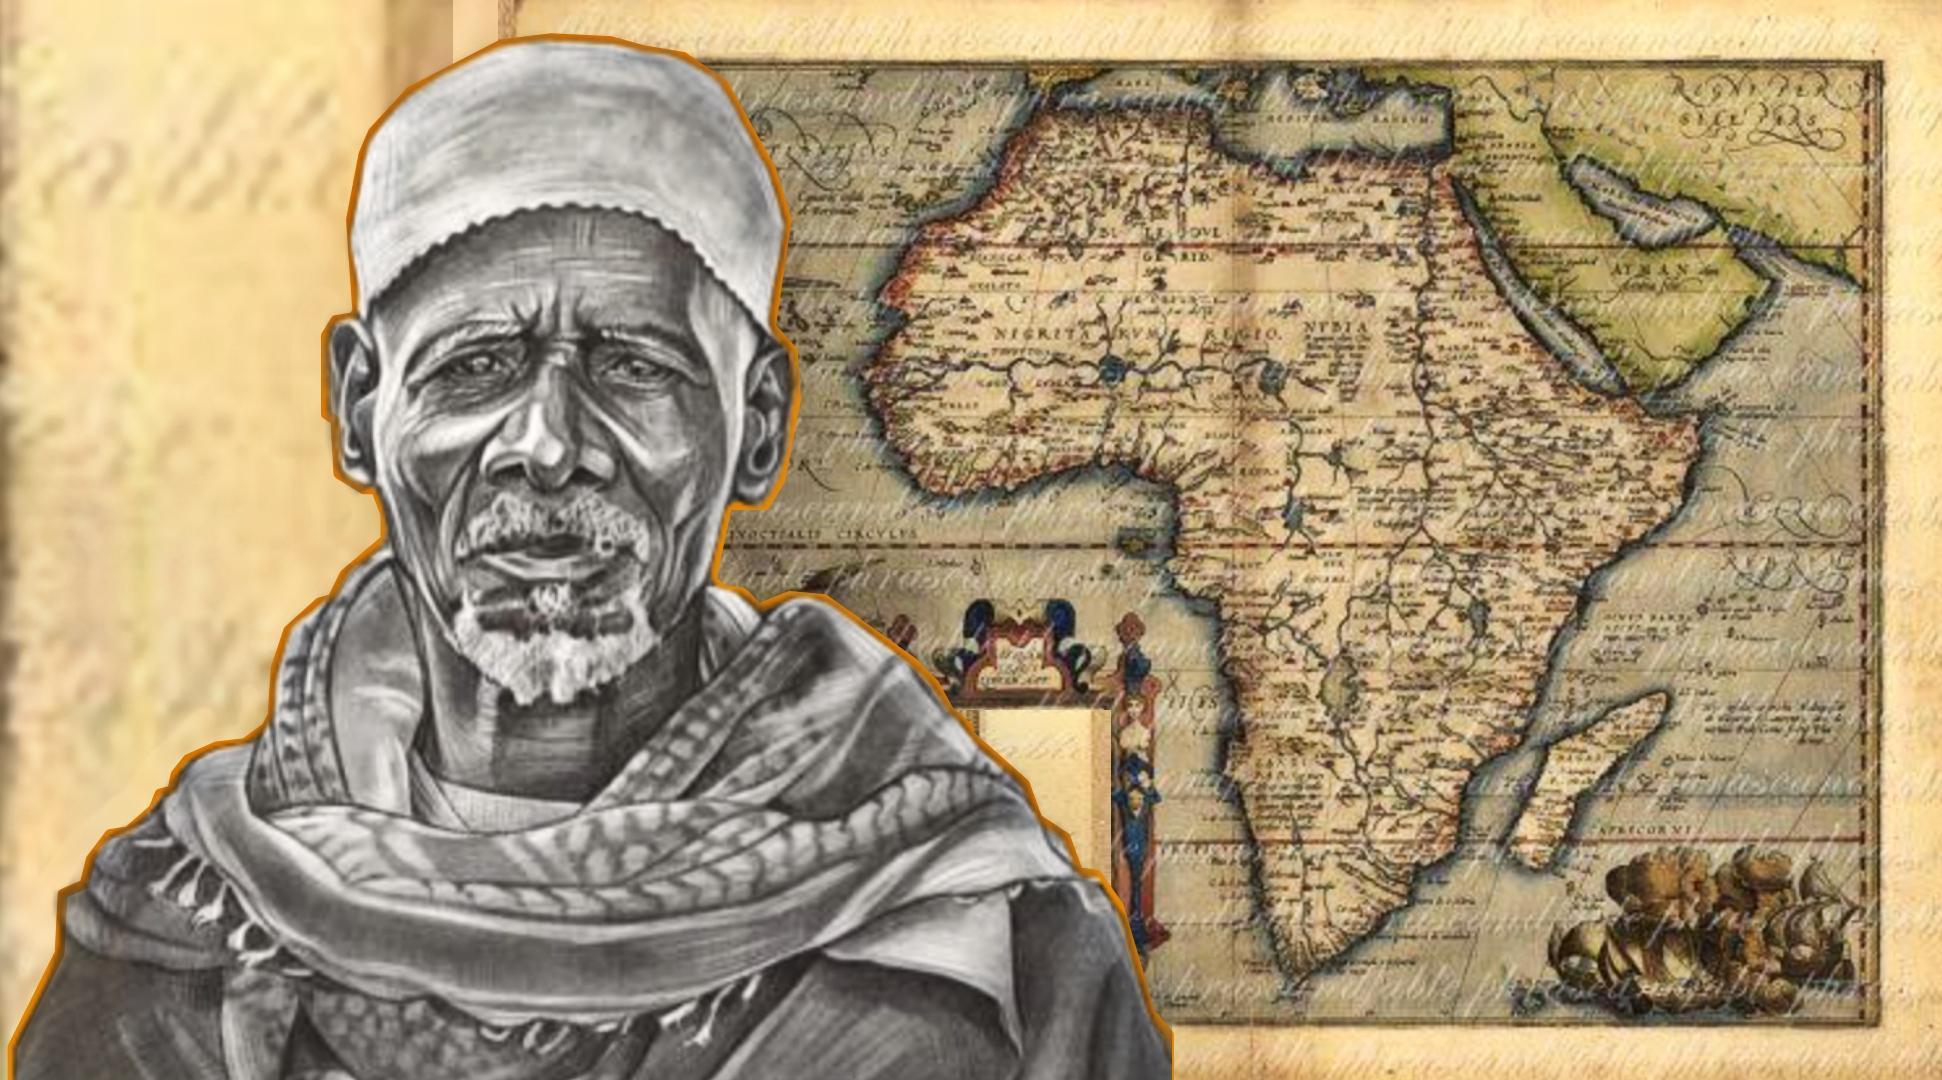 Almamy Suluku of Sierra Leone, the great politician c.1820 -1906